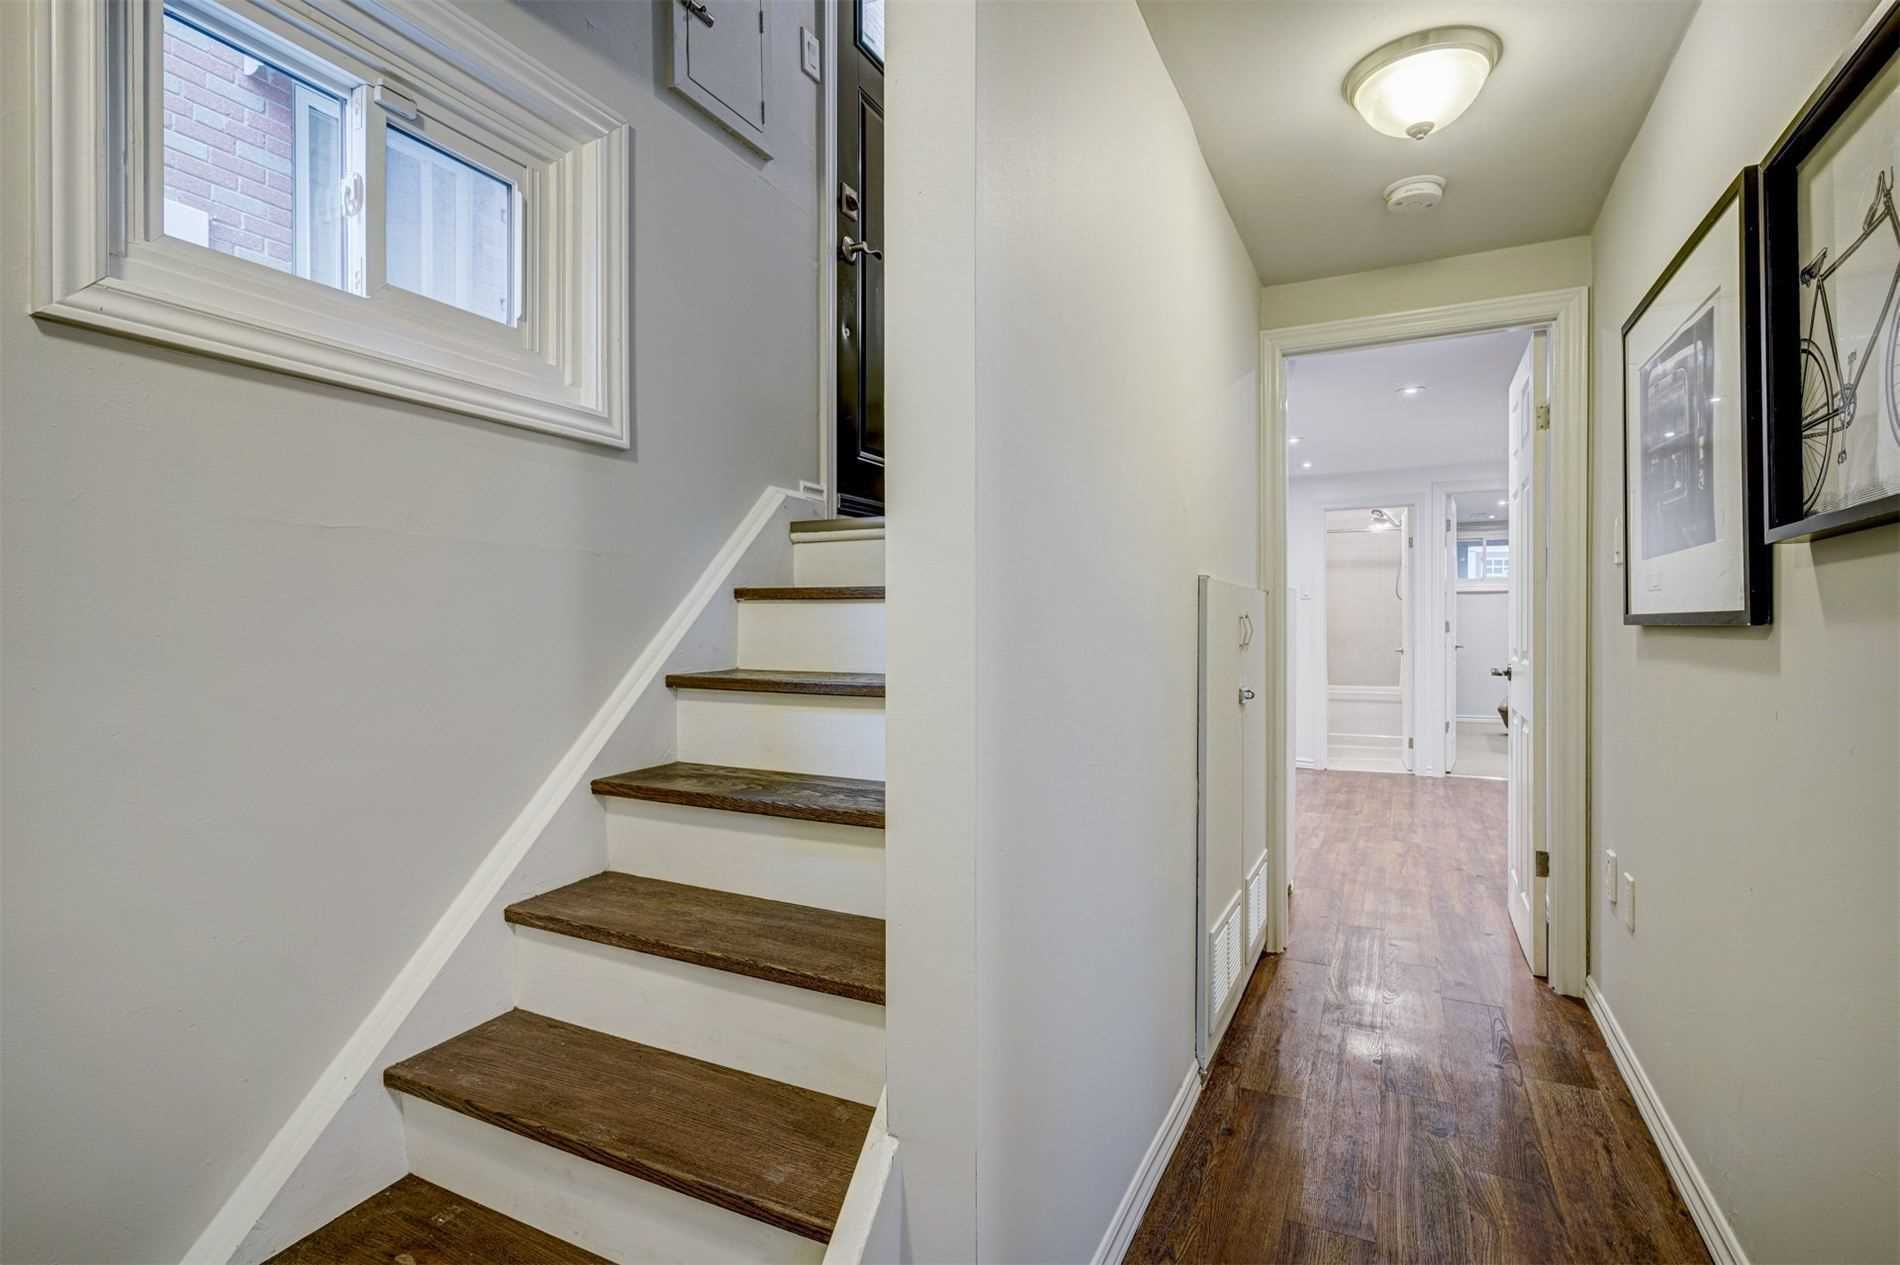 Photo 24: Photos: 92 Holborne Avenue in Toronto: Danforth Village-East York House (2-Storey) for sale (Toronto E03)  : MLS®# E5204452